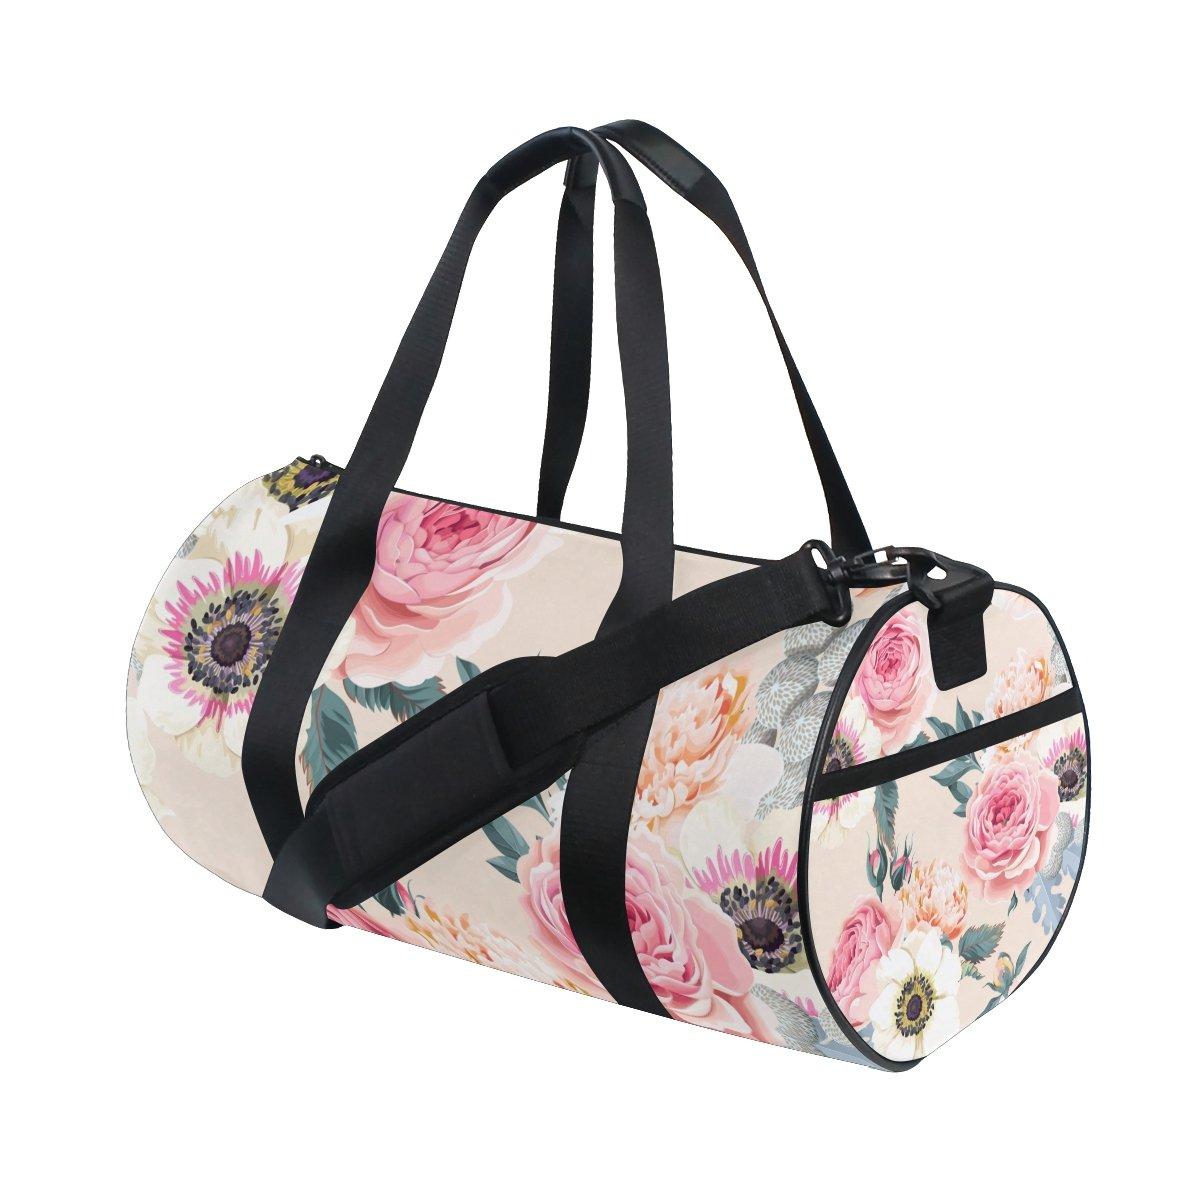 U LIFE Summer Spring Country Garden Floral Peony Flowers Sports Gym Shoulder Handy Duffel Bags for Women Men Kids Boys Girls